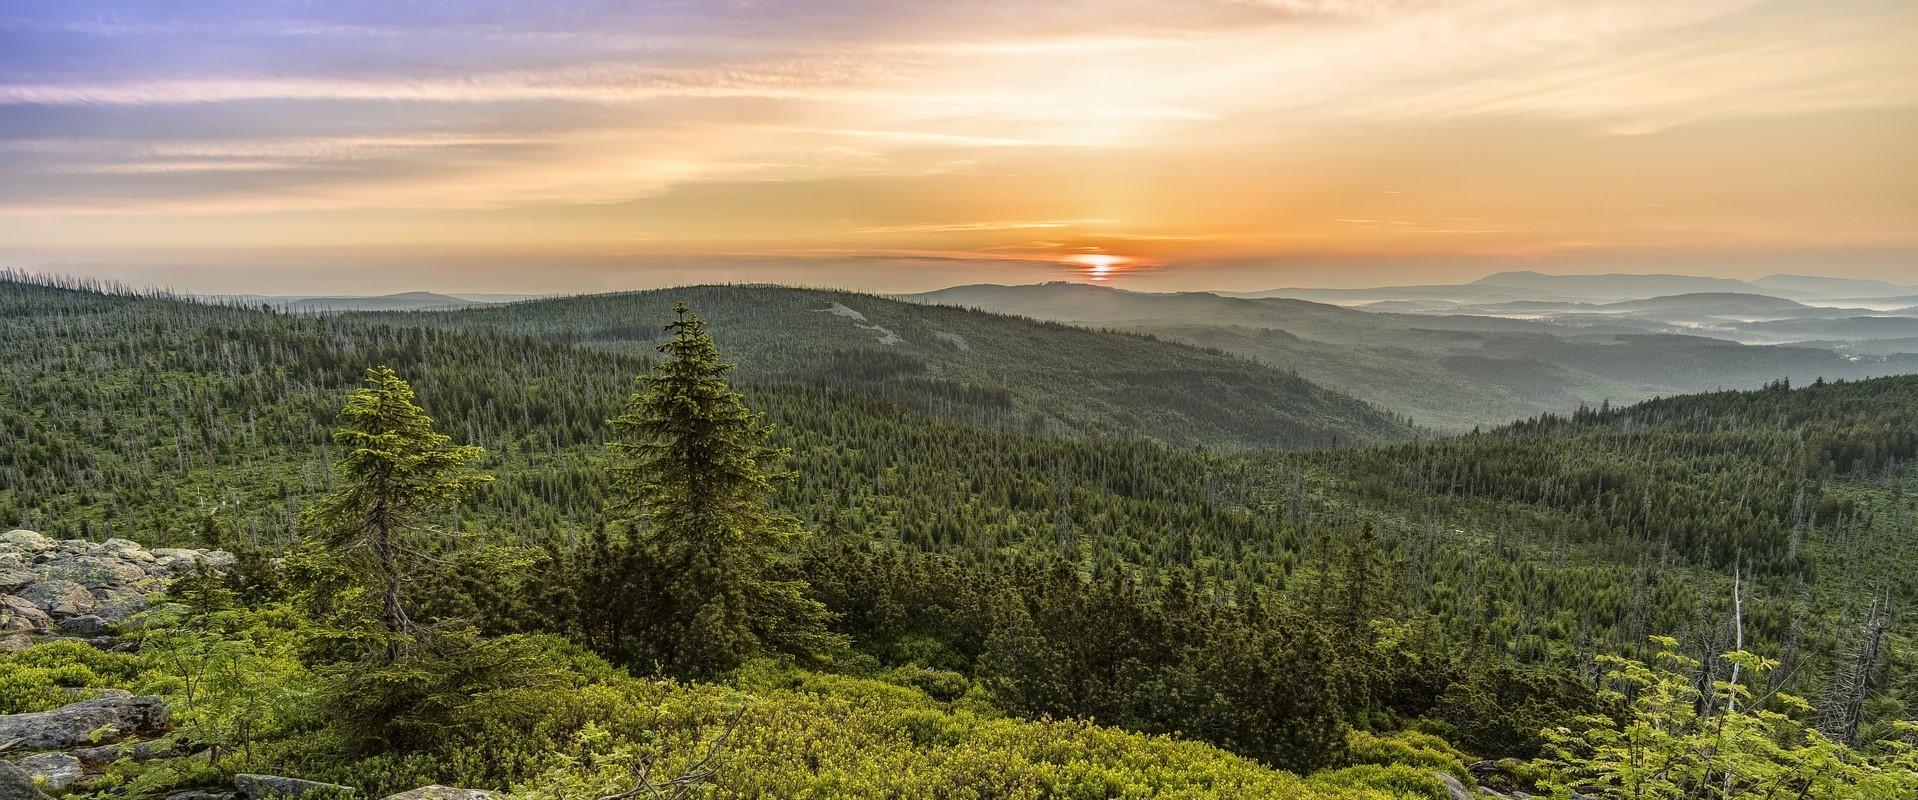 Panorama Sunrise Mountains